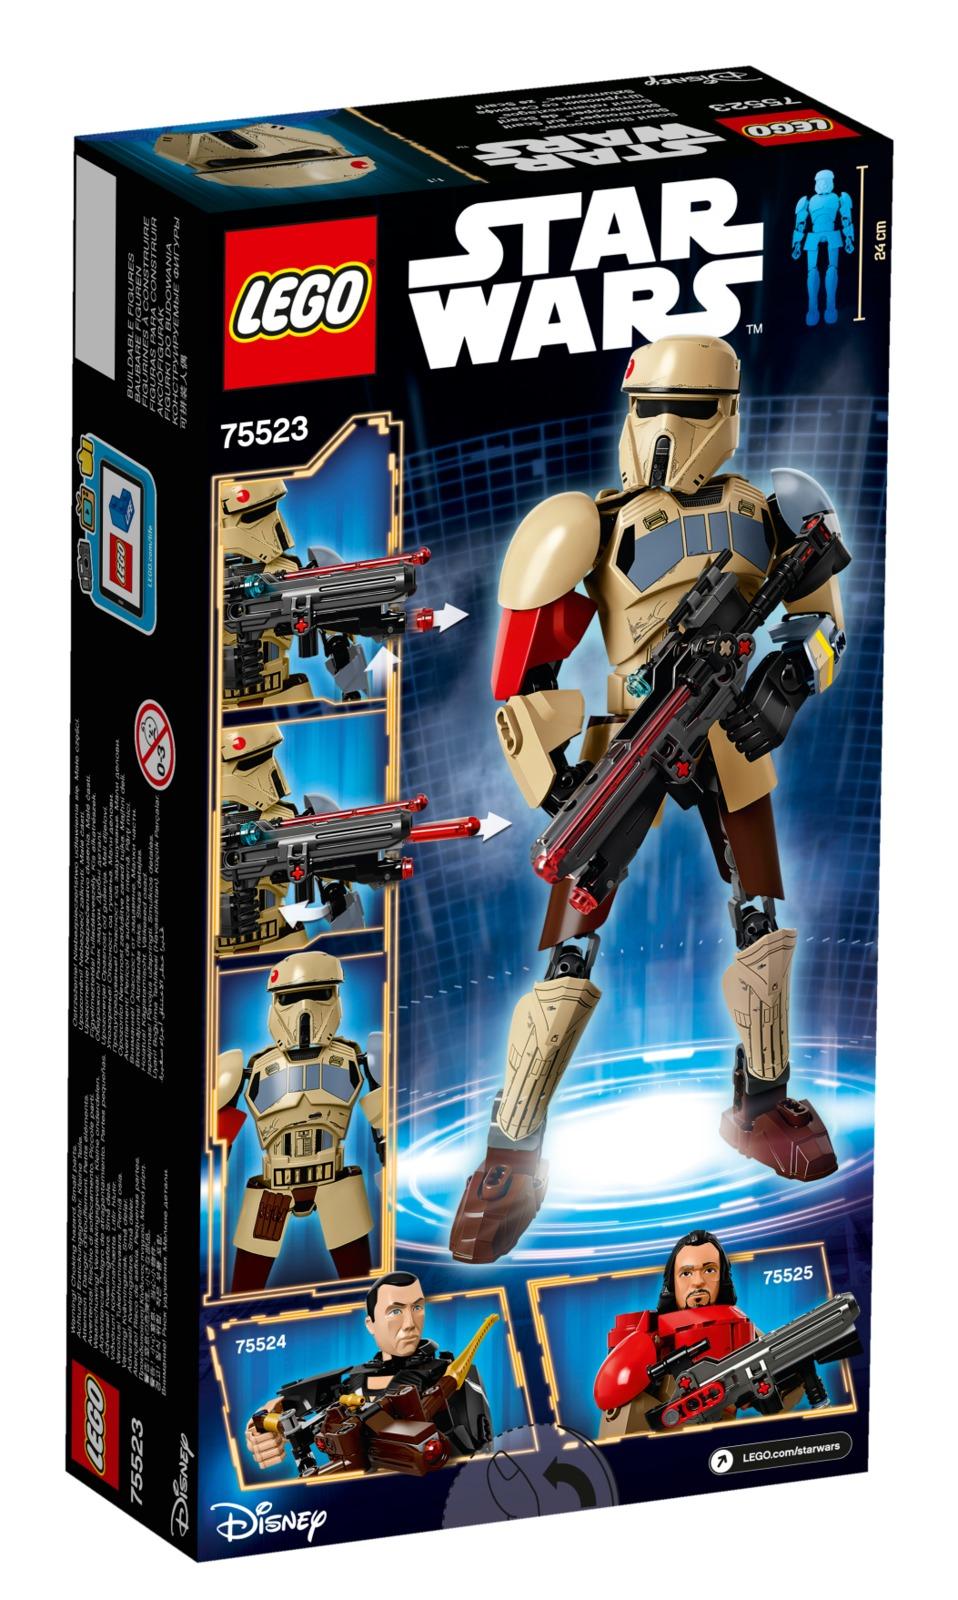 LEGO Star Wars: Scarif Stormtrooper (75523) image